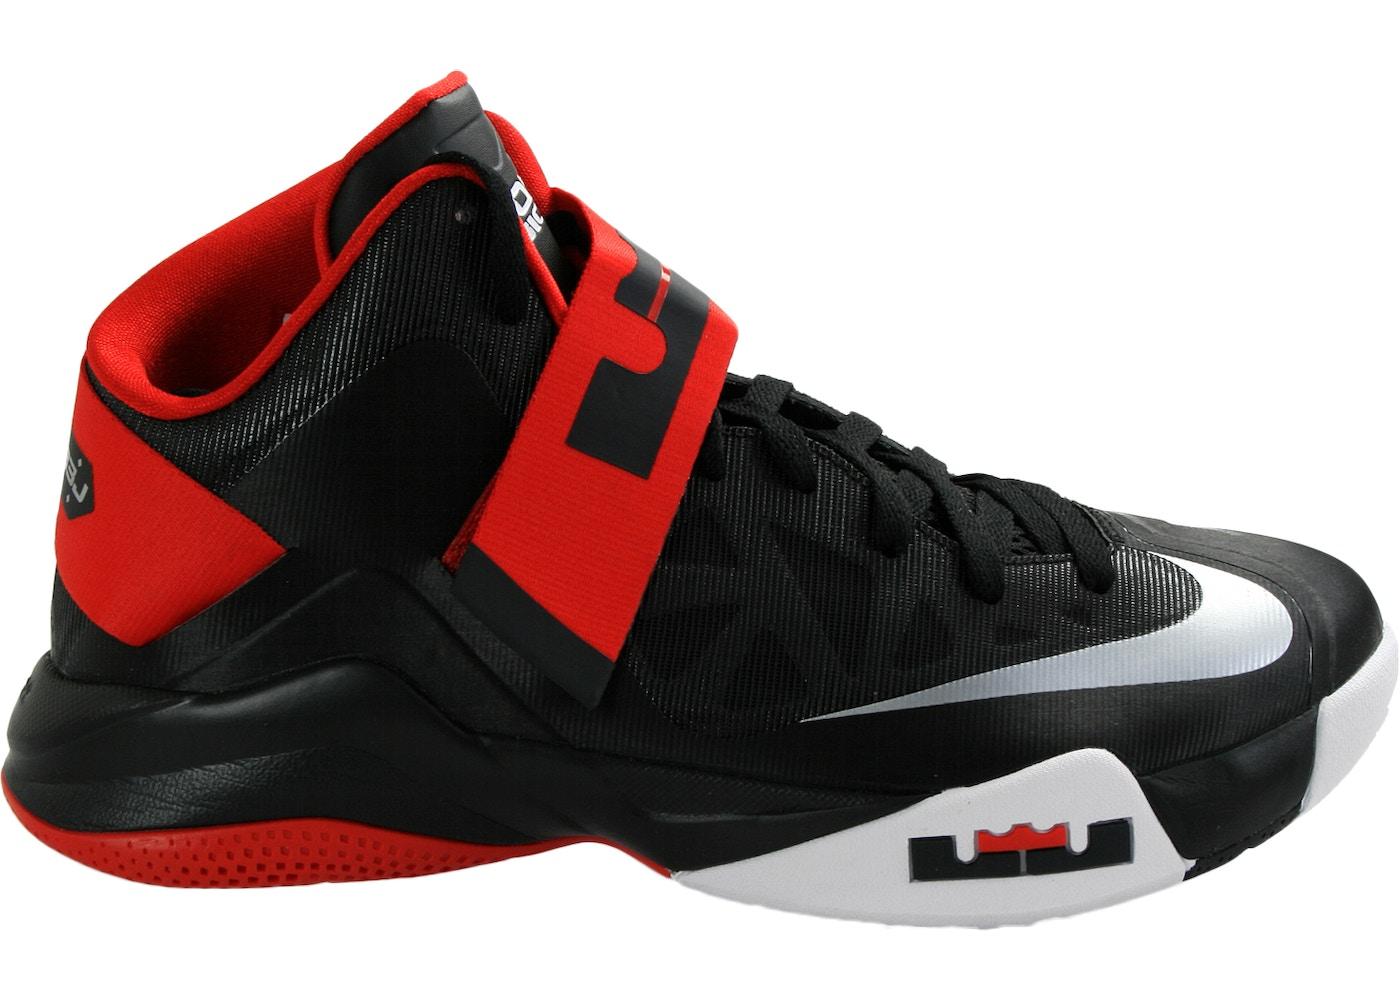 Identificar instinto locutor  Nike LeBron Zoom Soldier 6 Black Red White - 525015-001